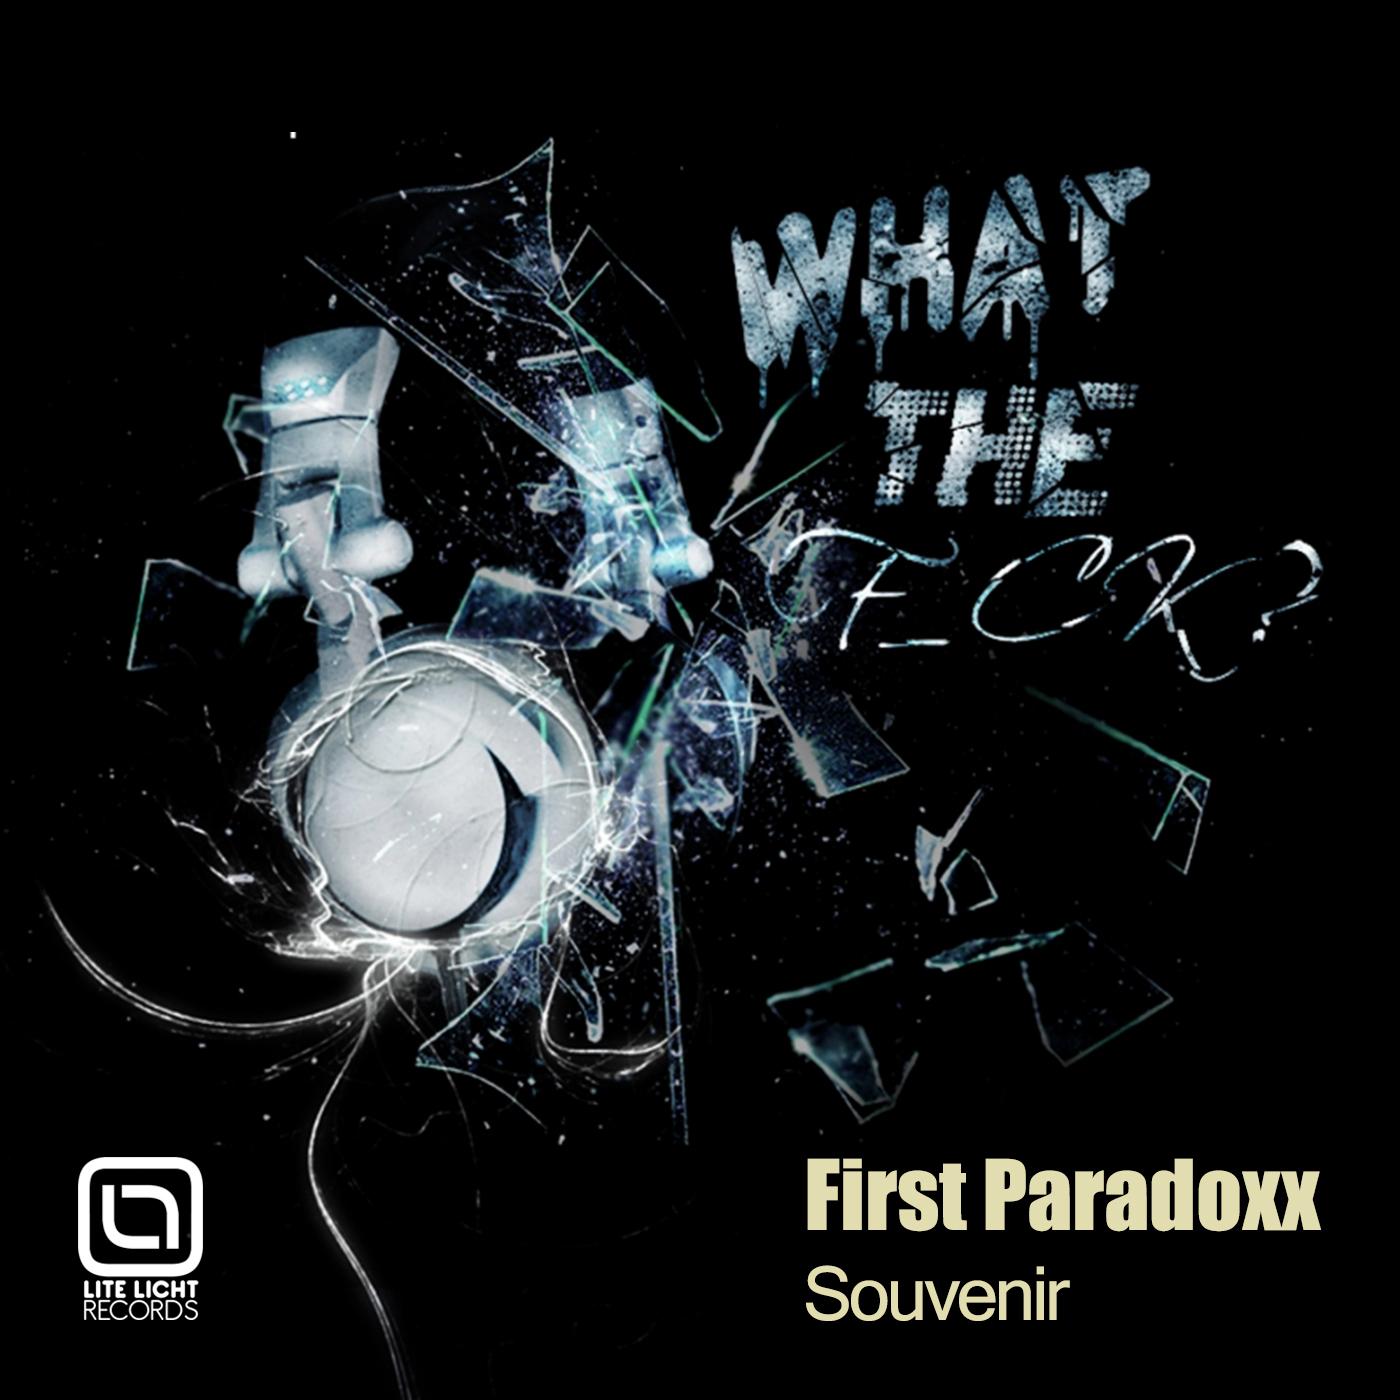 First-Paradoxx